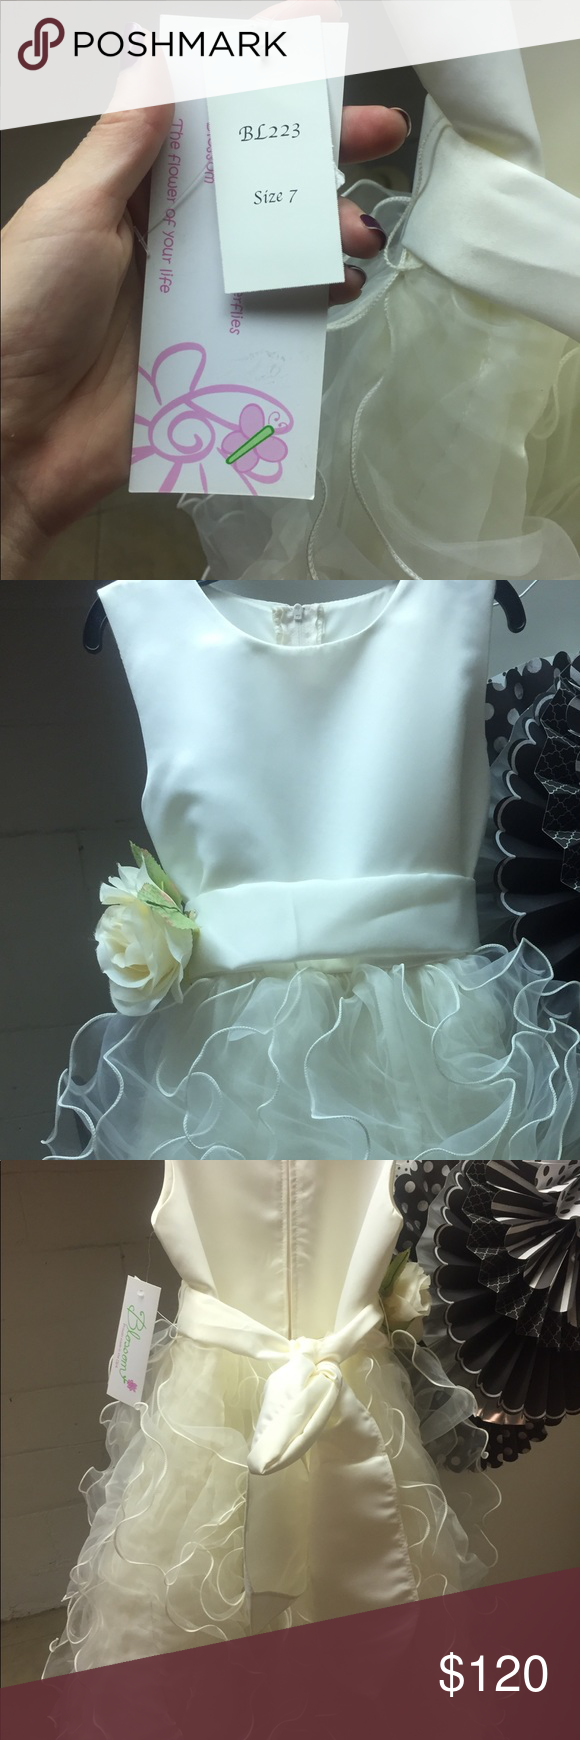 Young girls wedding dresses  Flower girl  special occasion dress NWT  Special occasion dresses